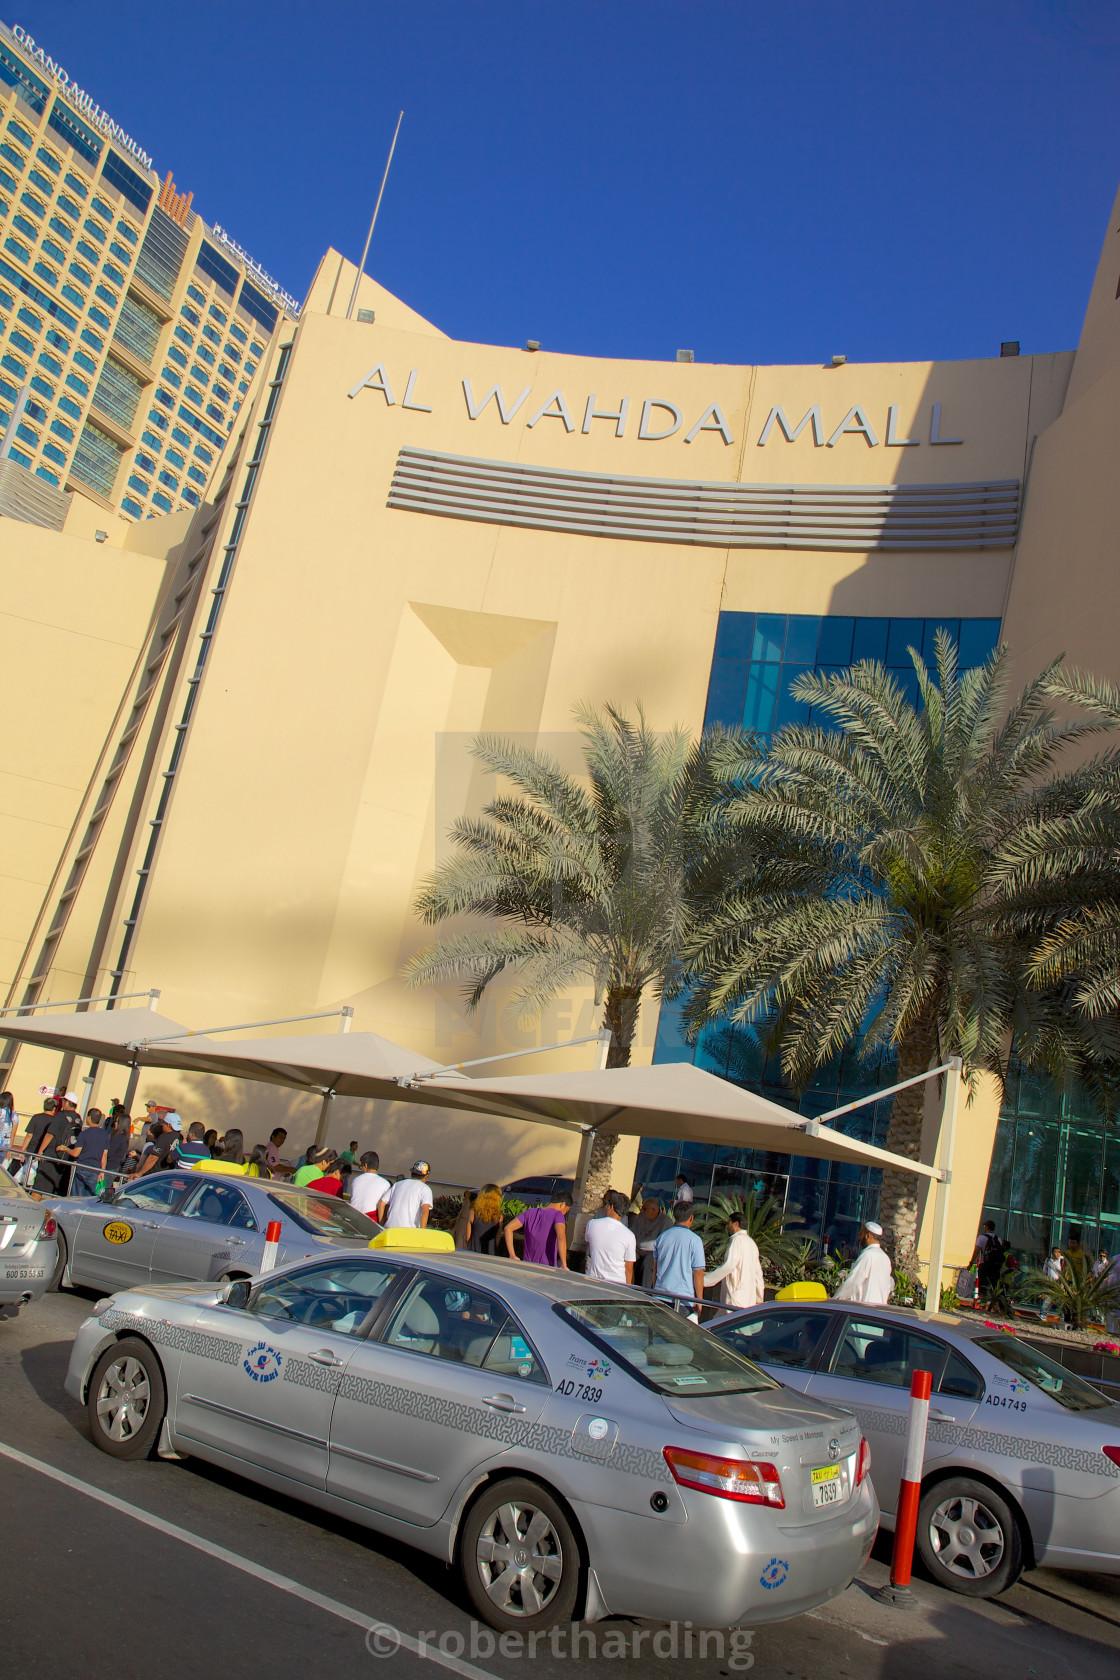 Al Wahda Mall and taxis, Abu Dhabi, United Arab Emirates